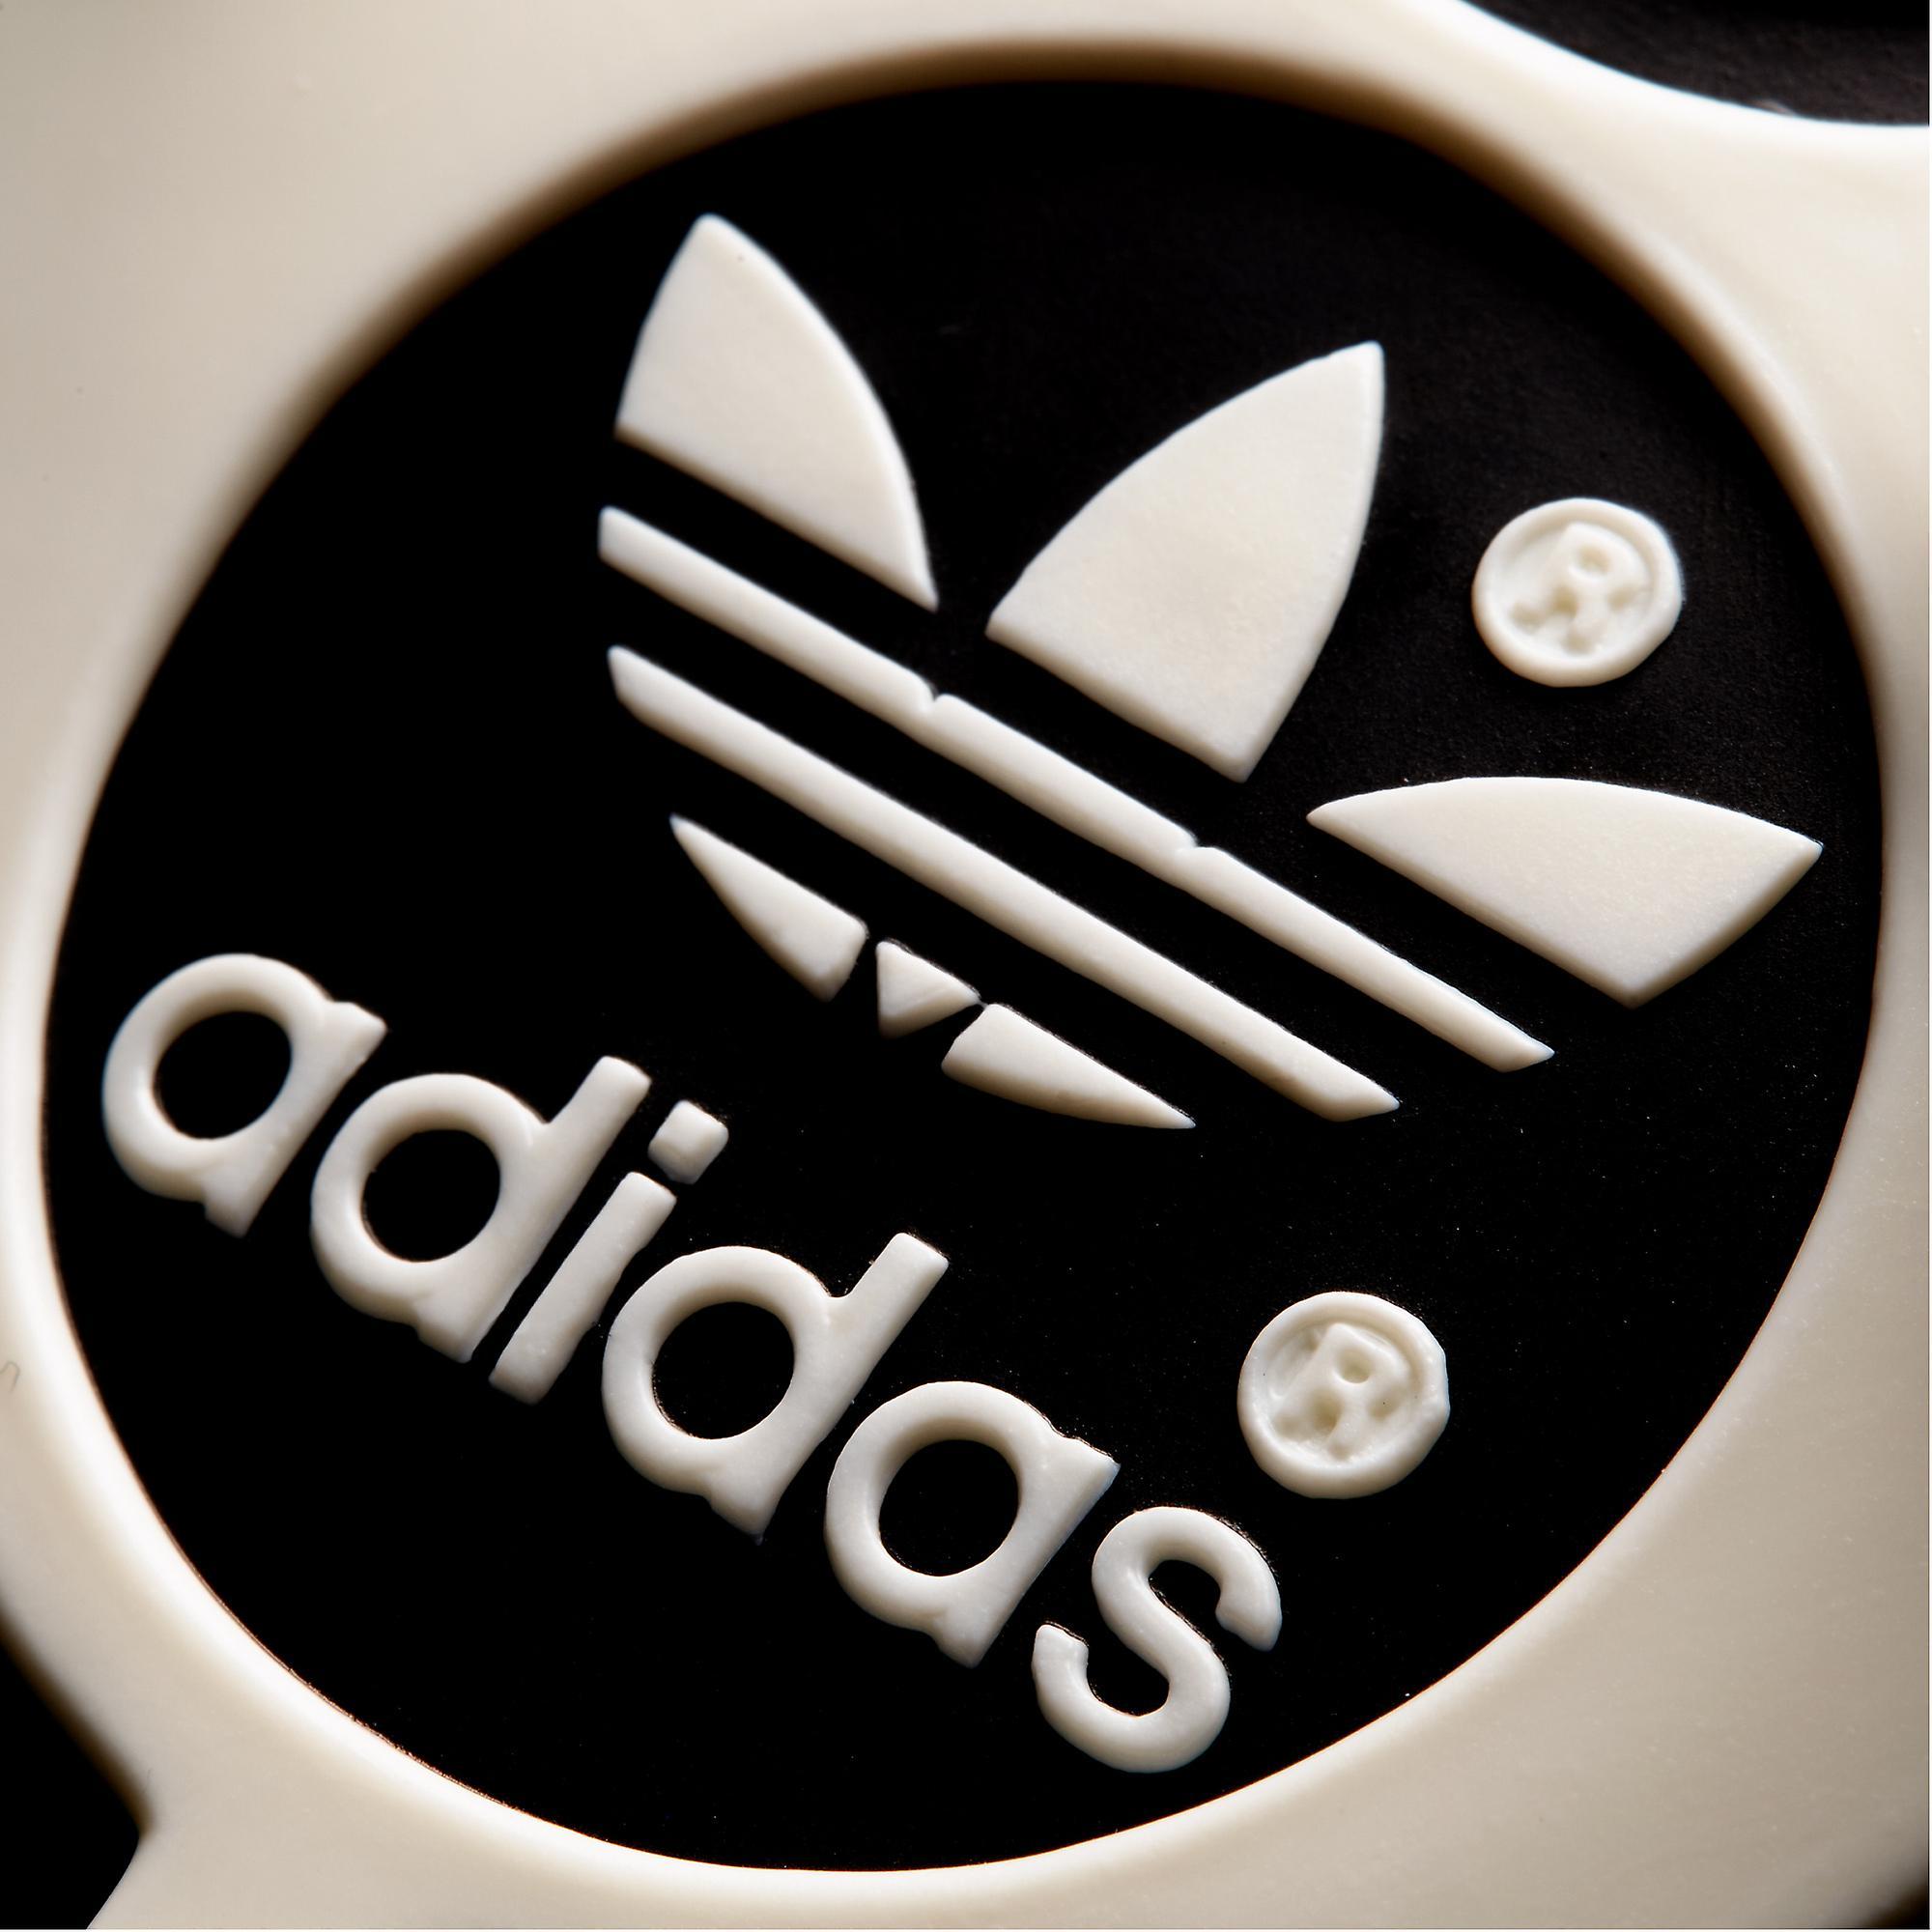 adidas Kaiser 5 Cup SG Soft Ground Mens Football Boot Black/ White